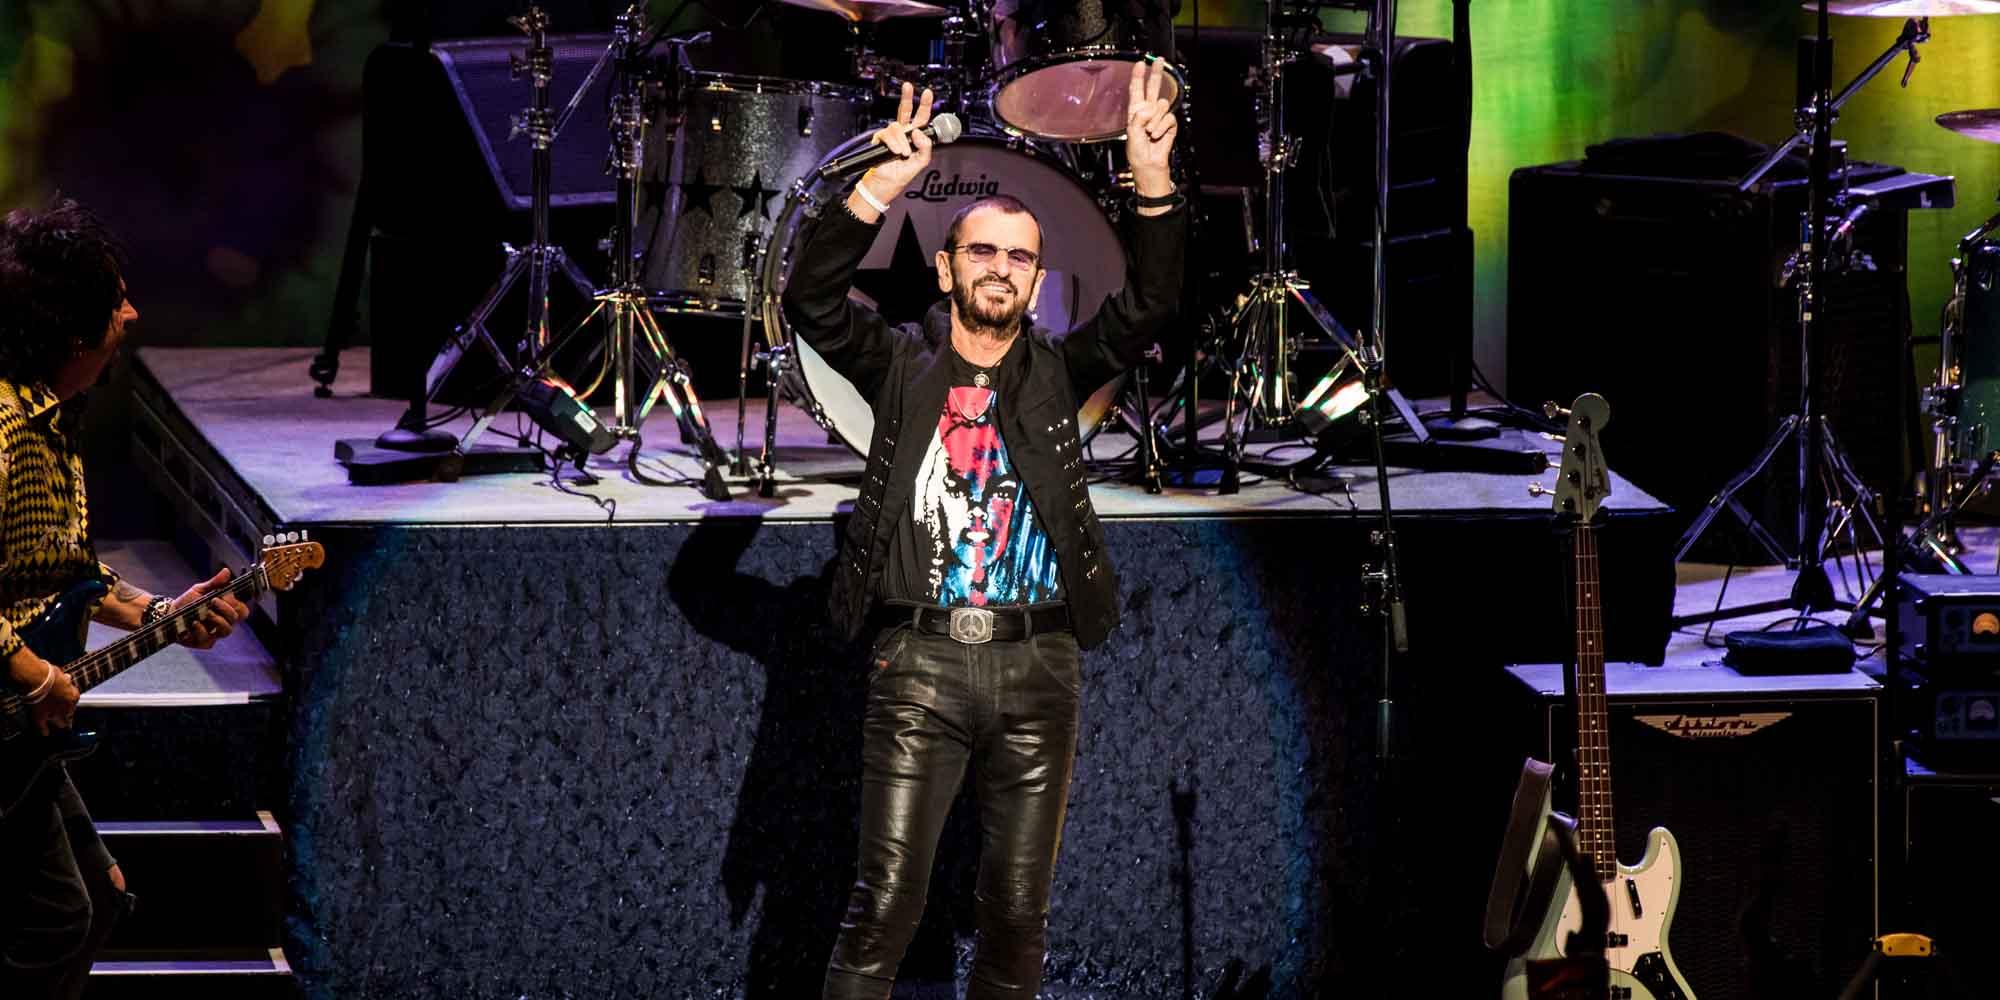 Ringo Starr Beatles Live Performance MN Minneapolis Ordway